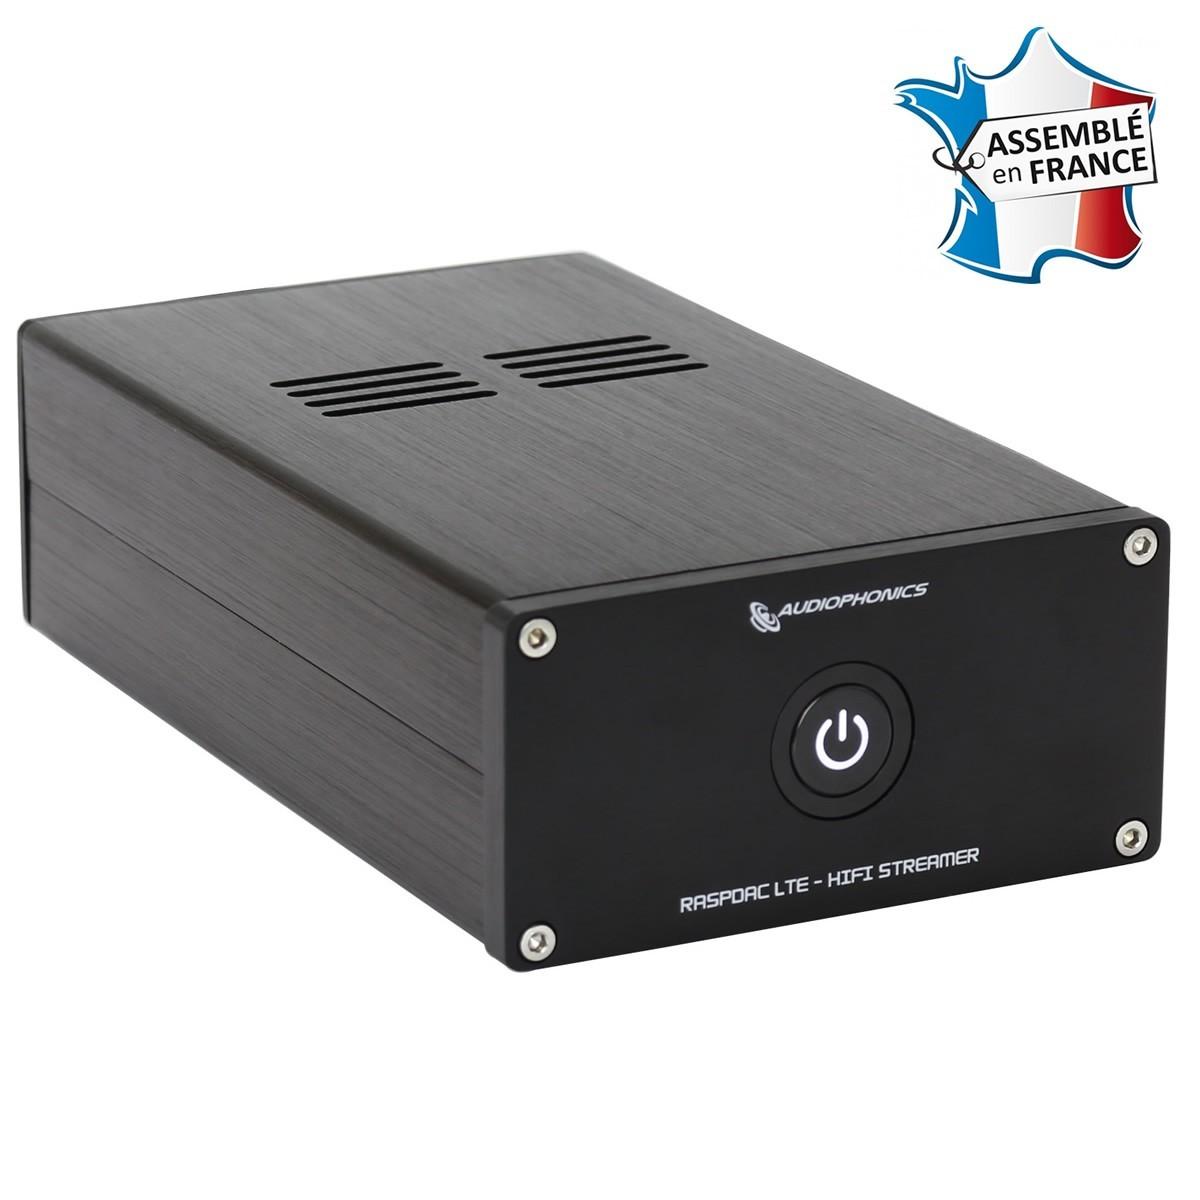 AUDIOPHONICS RaspDAC I-TDA1387 - Streamer Raspberry Pi & DAC TCXO